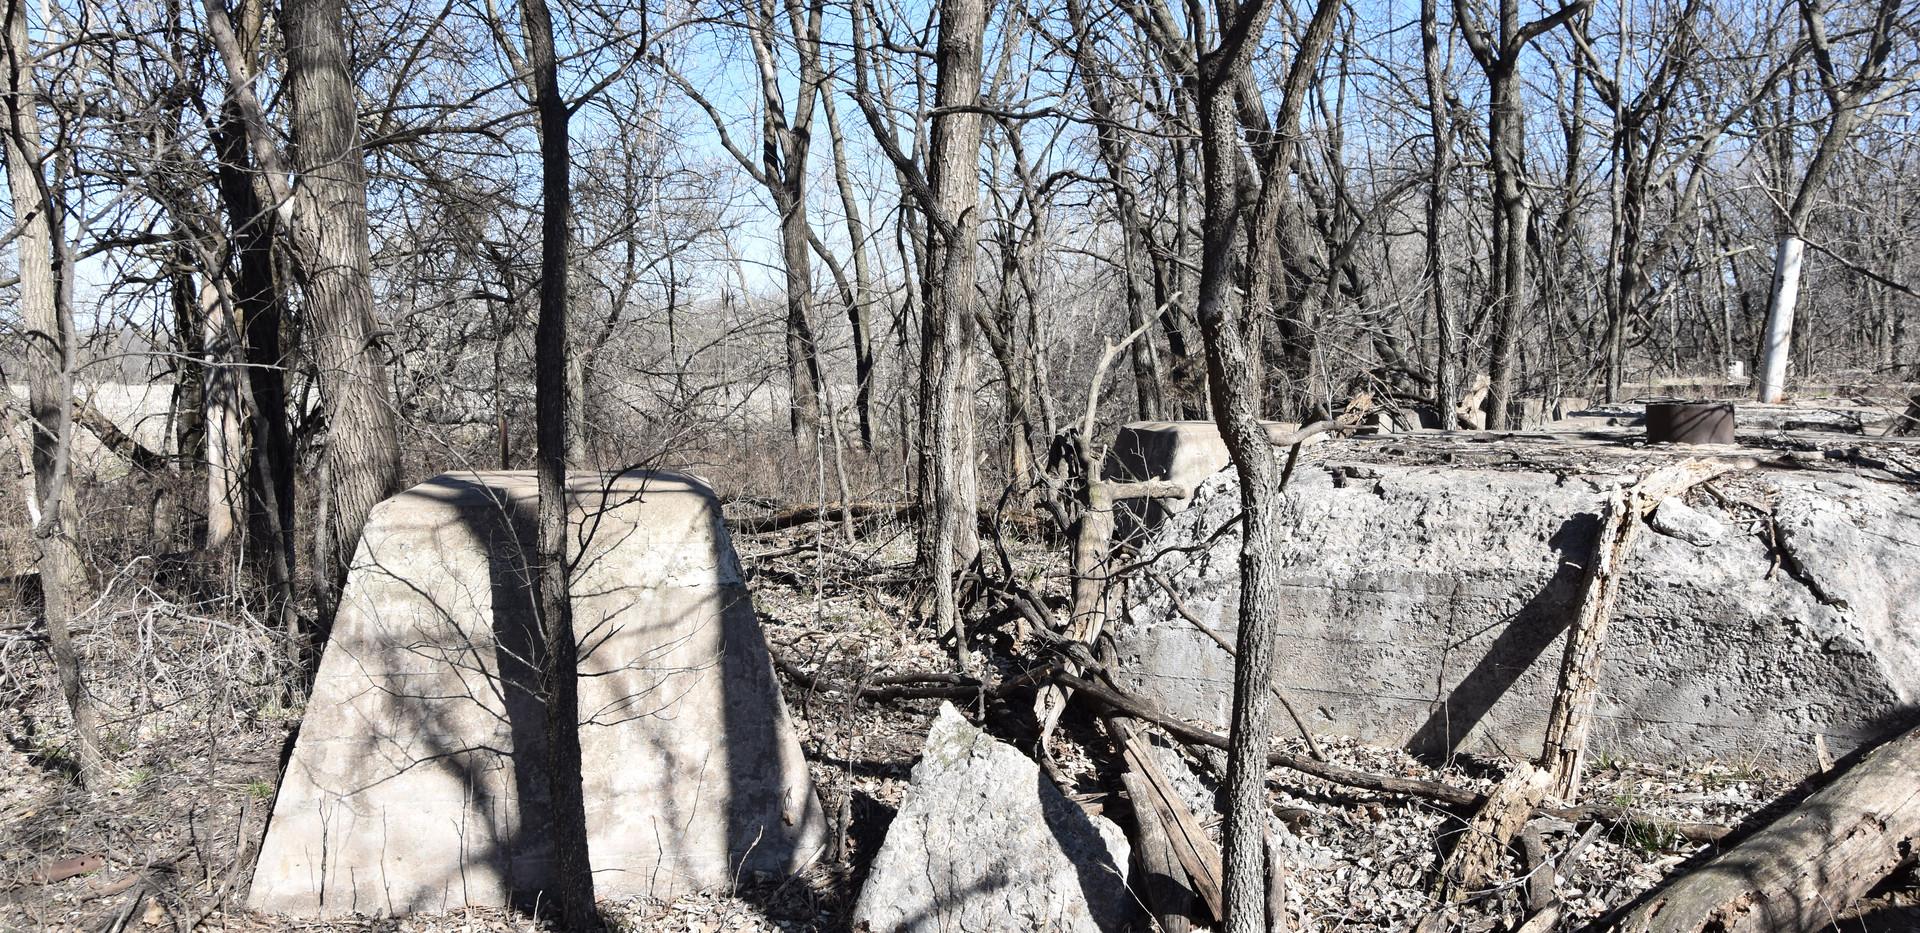 CRIP base remains of water tanks